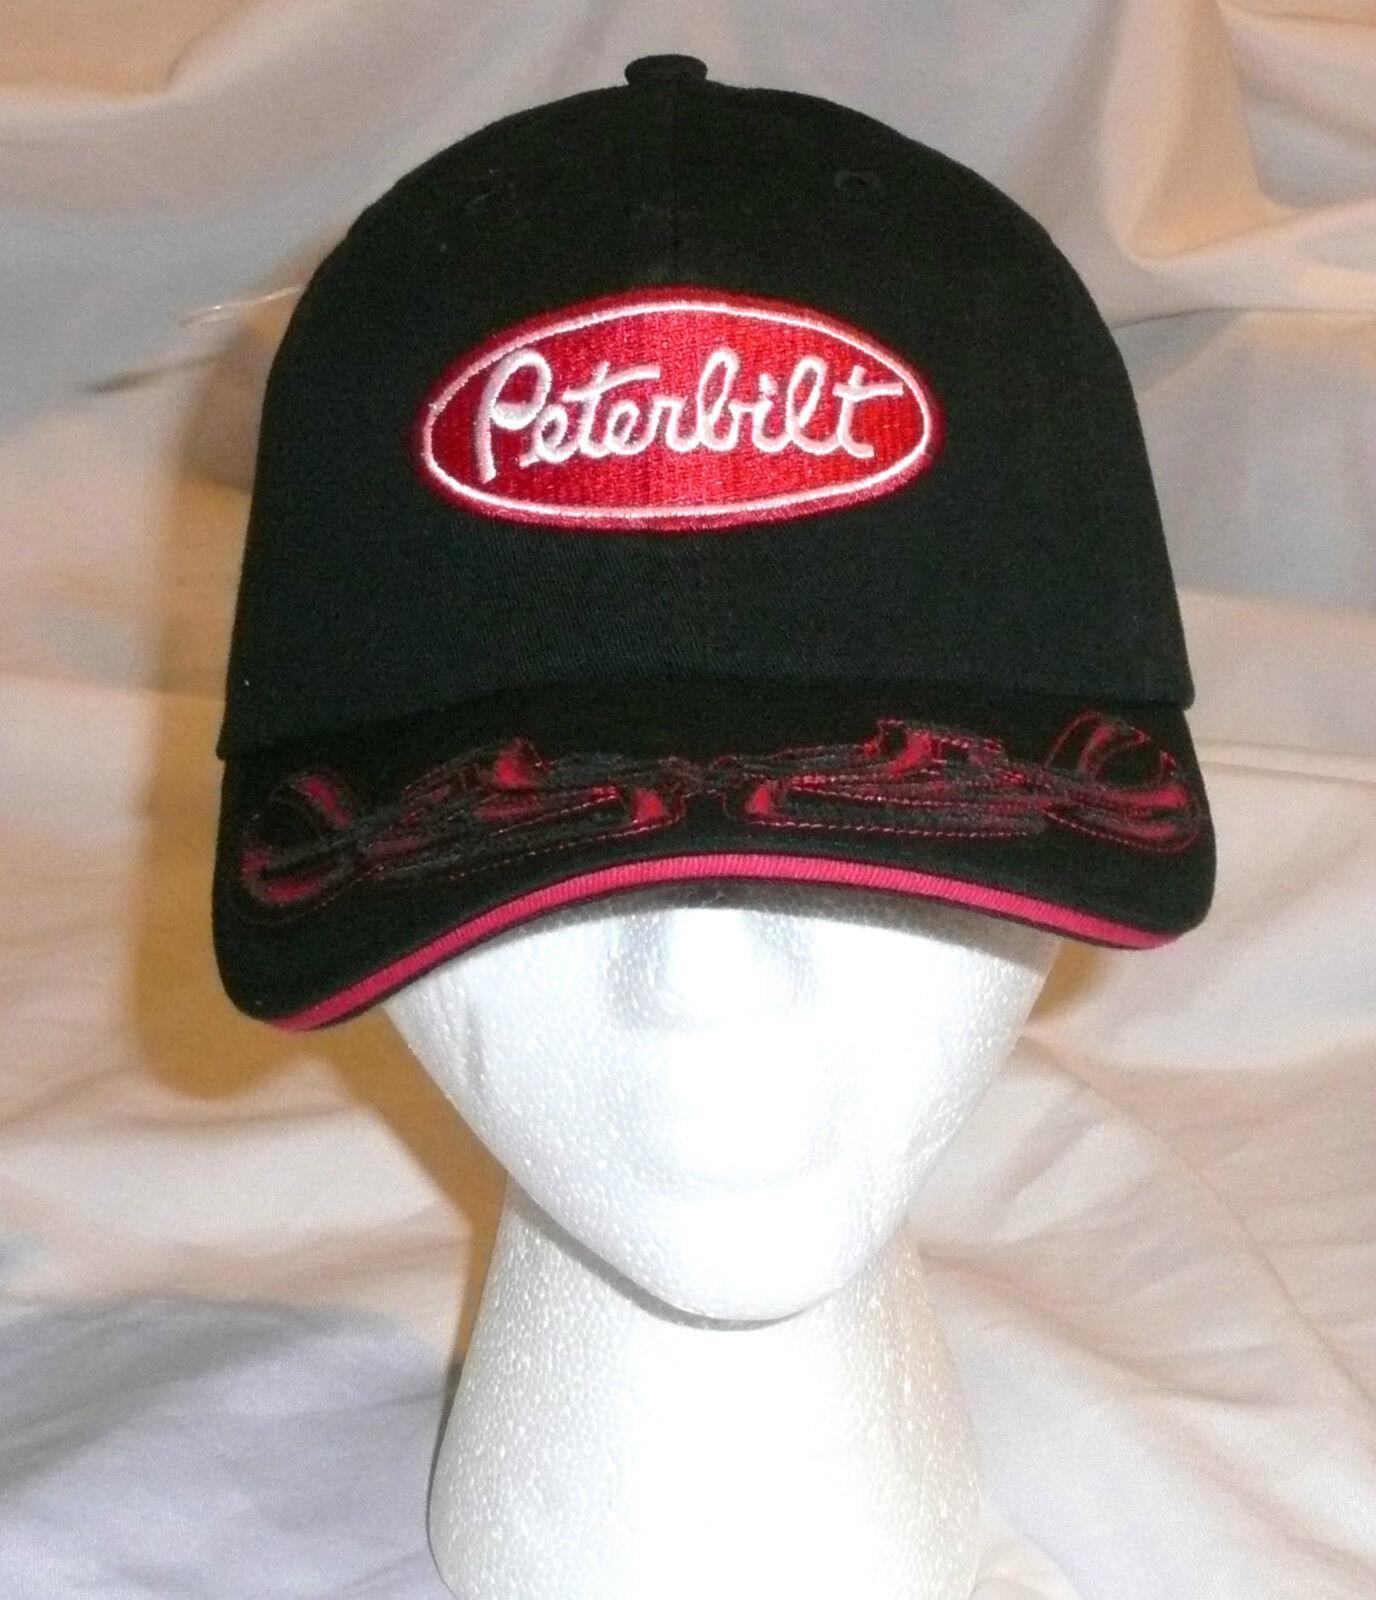 Peterbilt Black Tribal Visor Trucker Hat Cap Adjustable Cotton >new